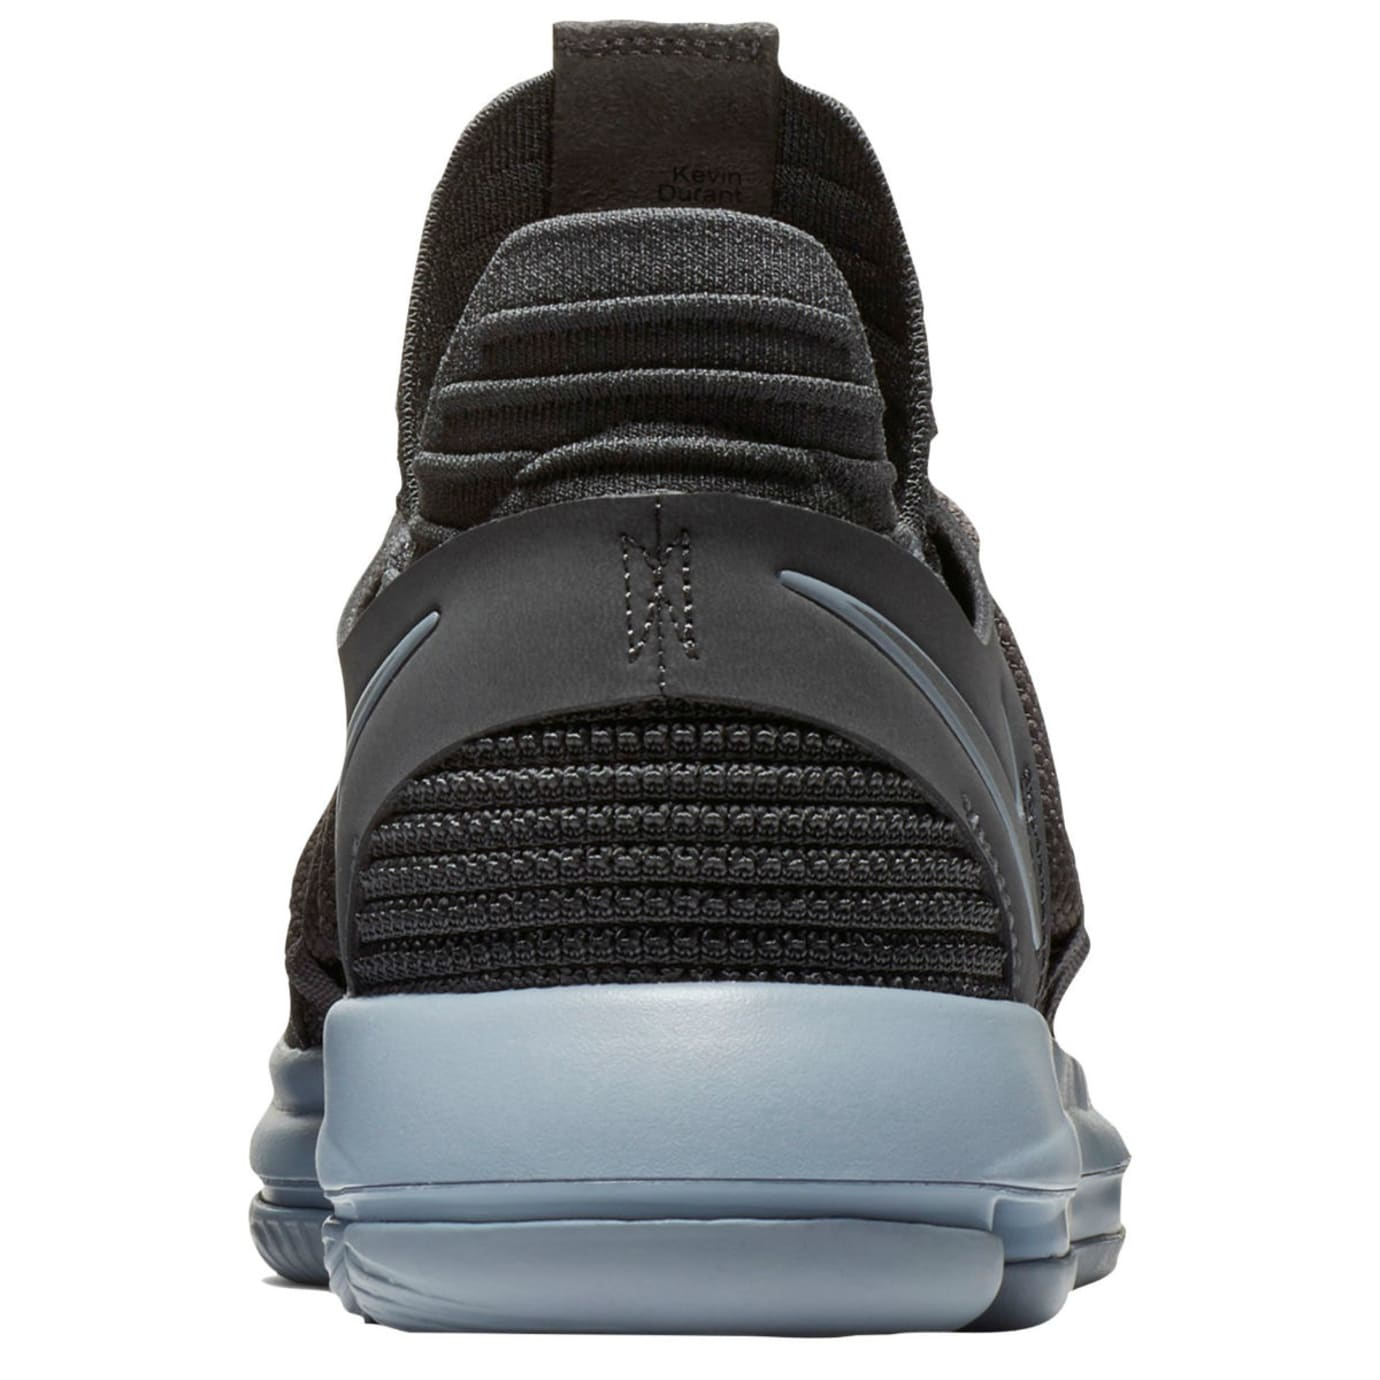 cheaper 8581c f5213 Nike KD 10 Dark Grey Release Date Heel 897815-005